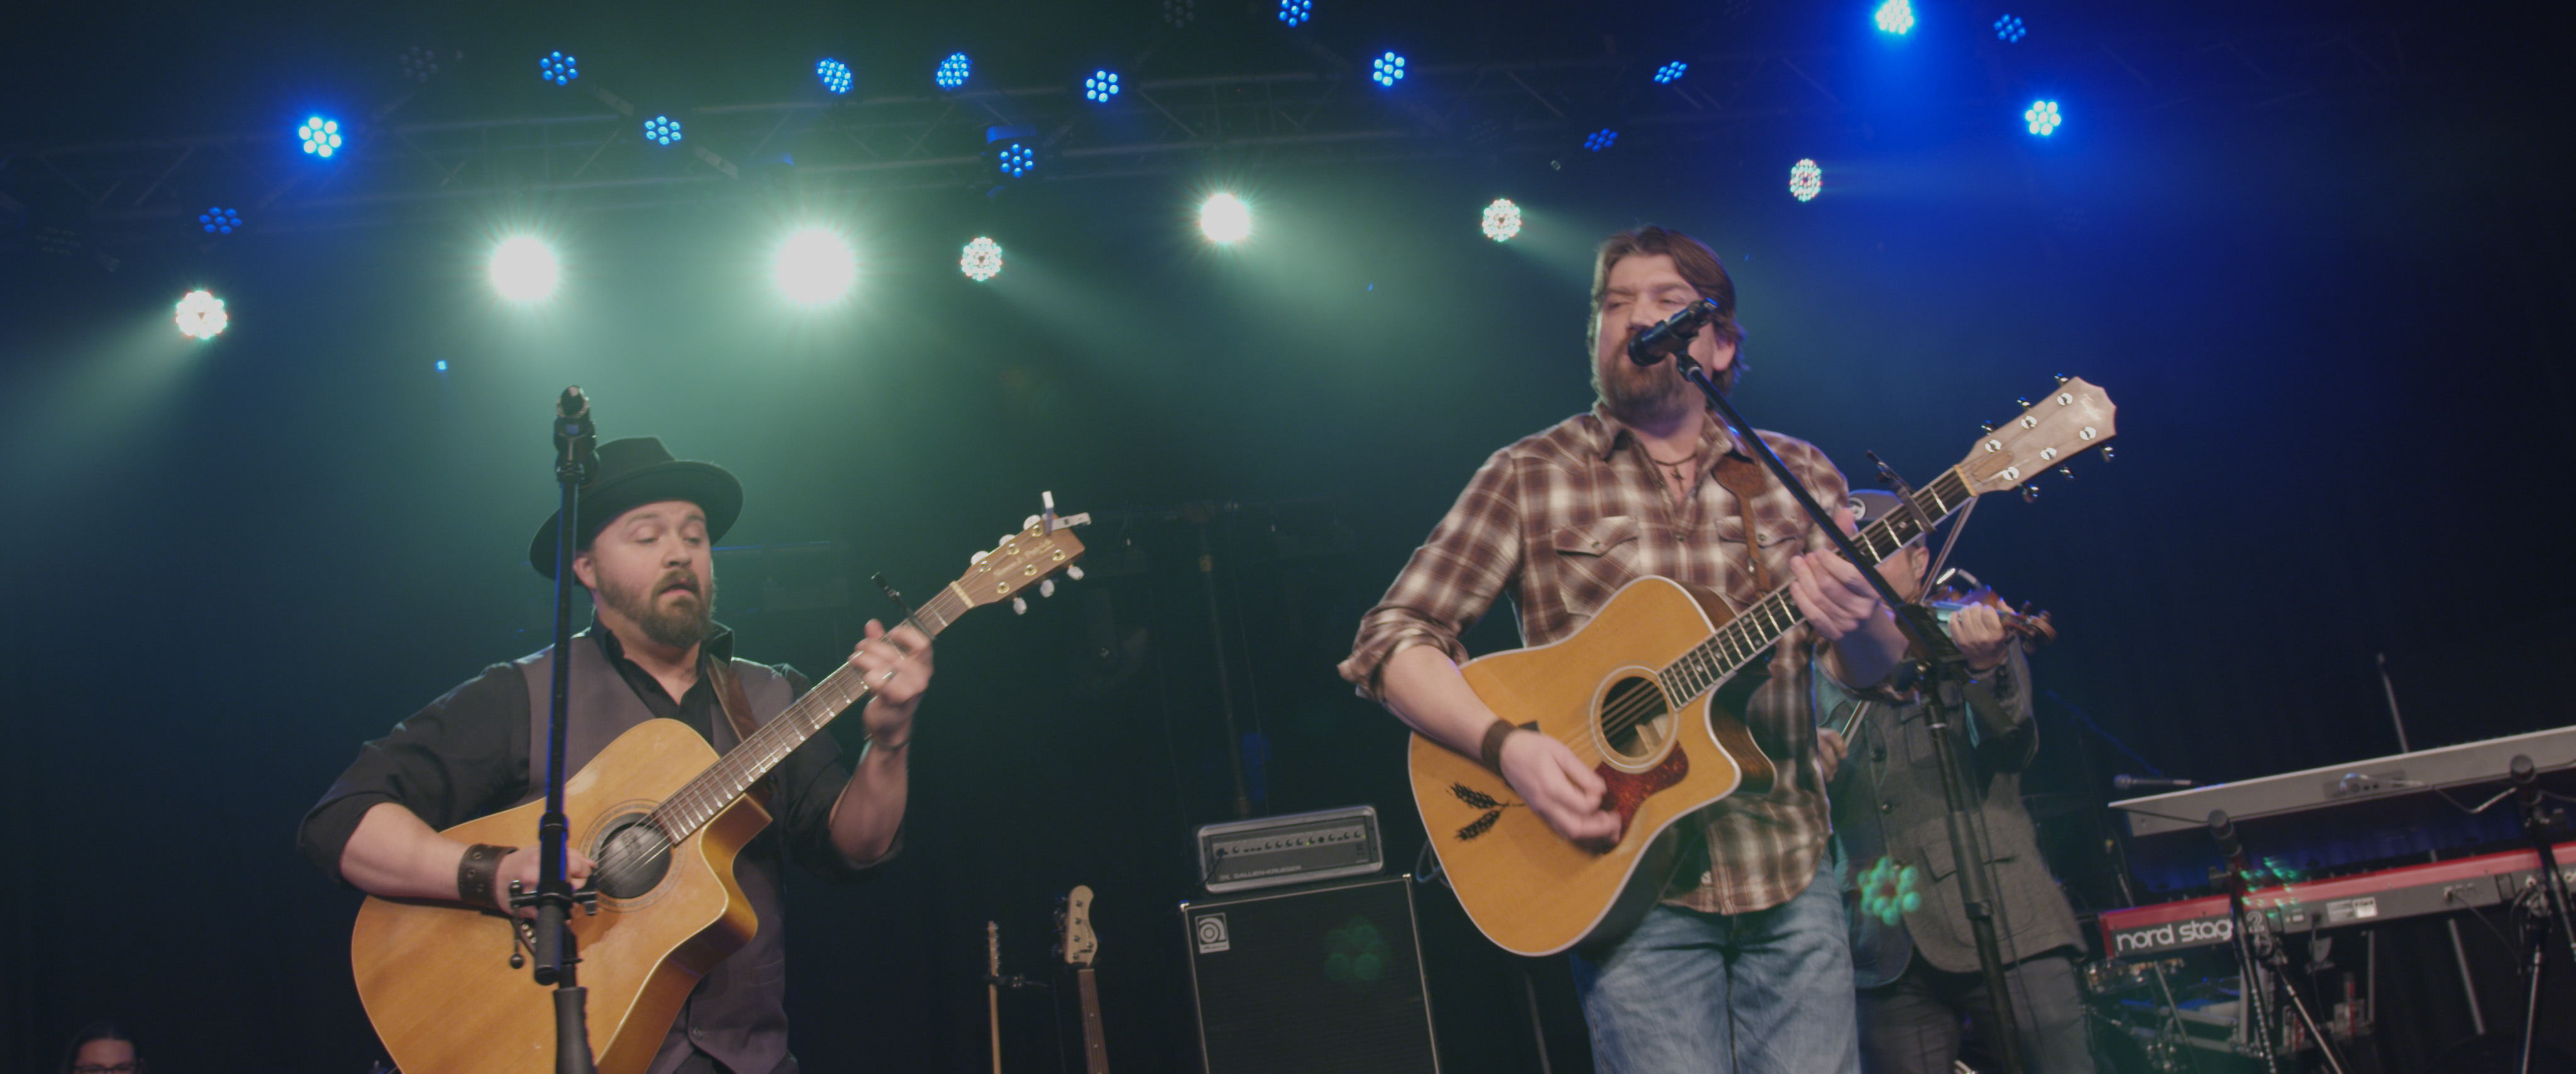 Blake Reid Band - 2017 ACMA's 07